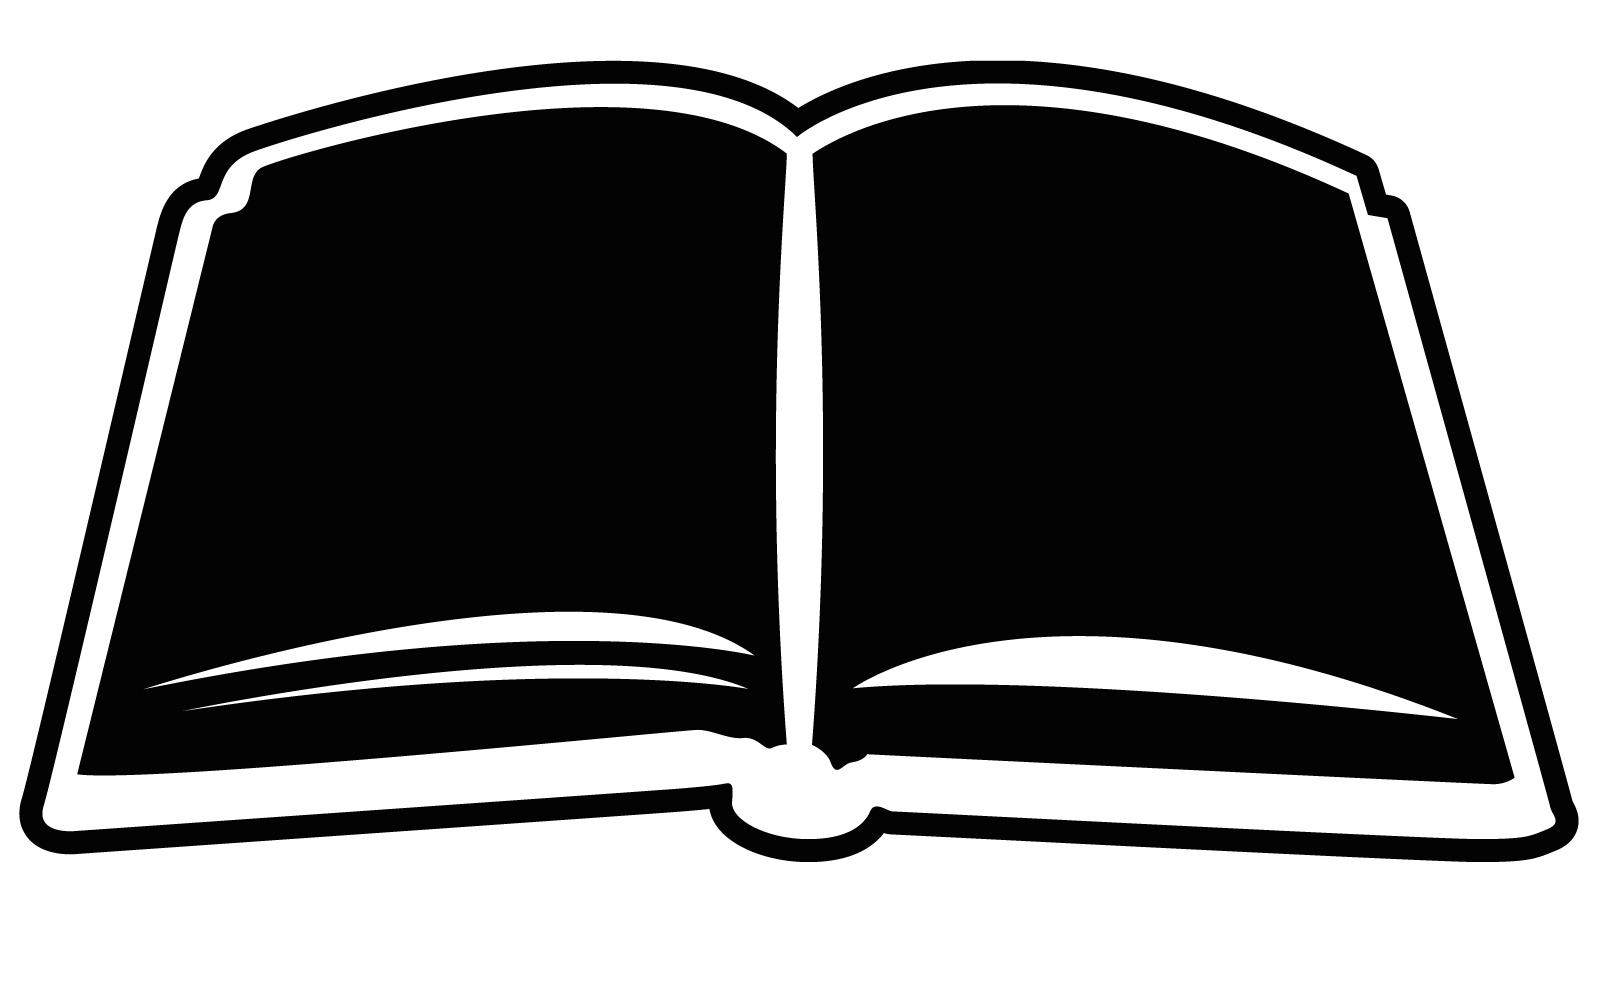 Open book clip art 6